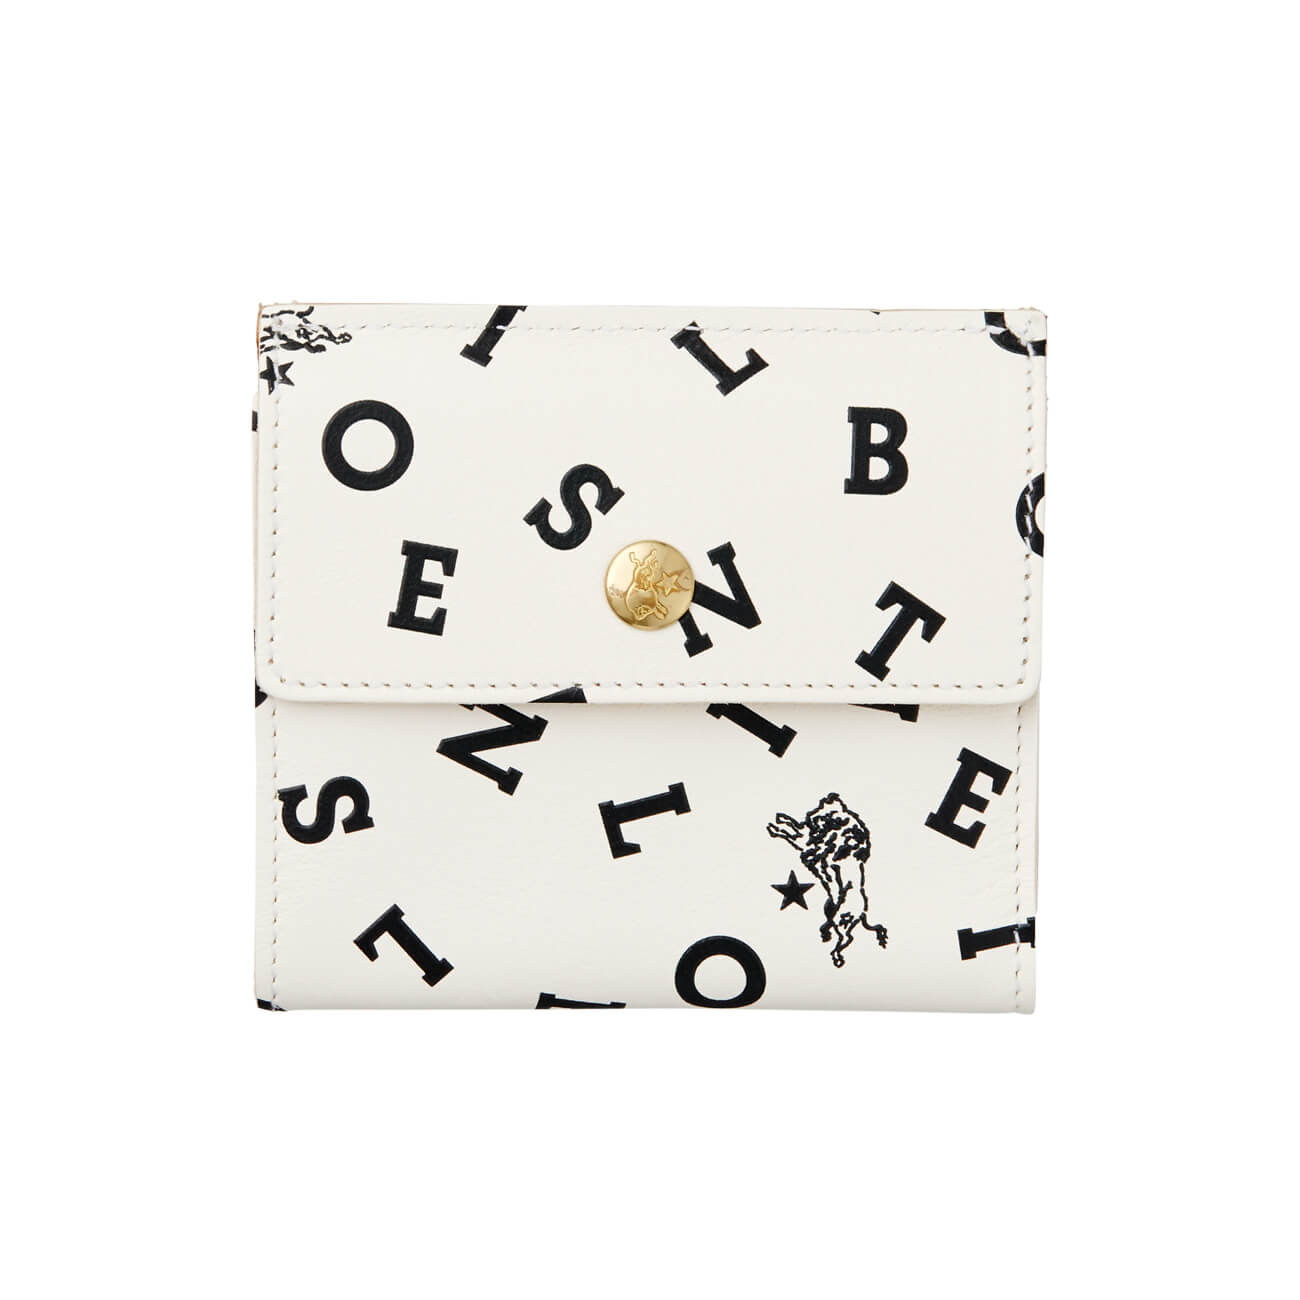 IL BISONTE (イル ビゾンテ) 日本公式オンラインストア 折財布 54192312340